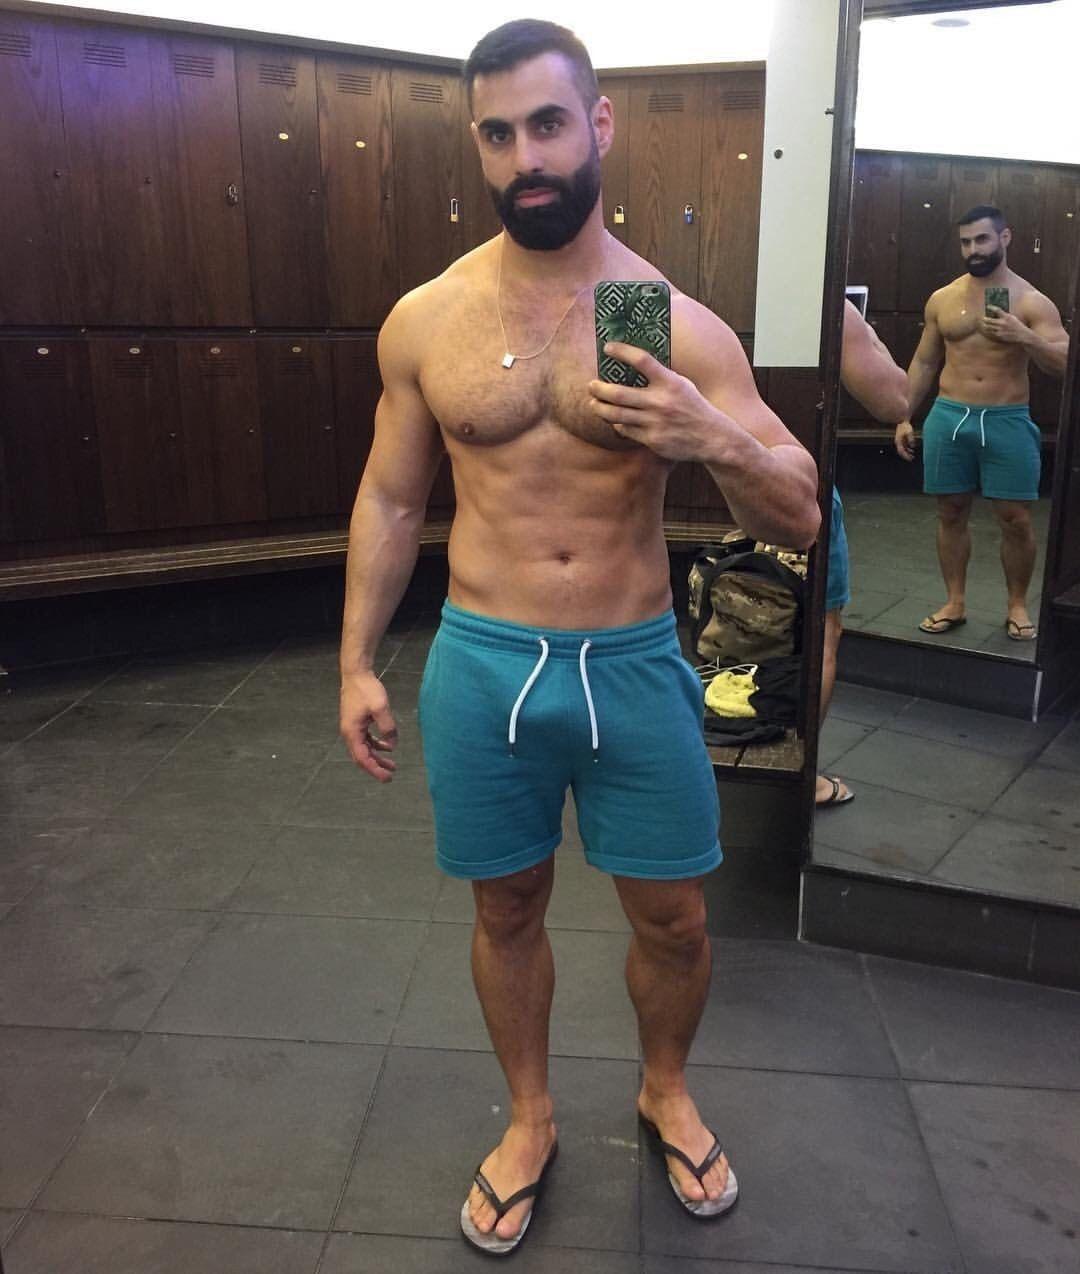 Muscle flip flop